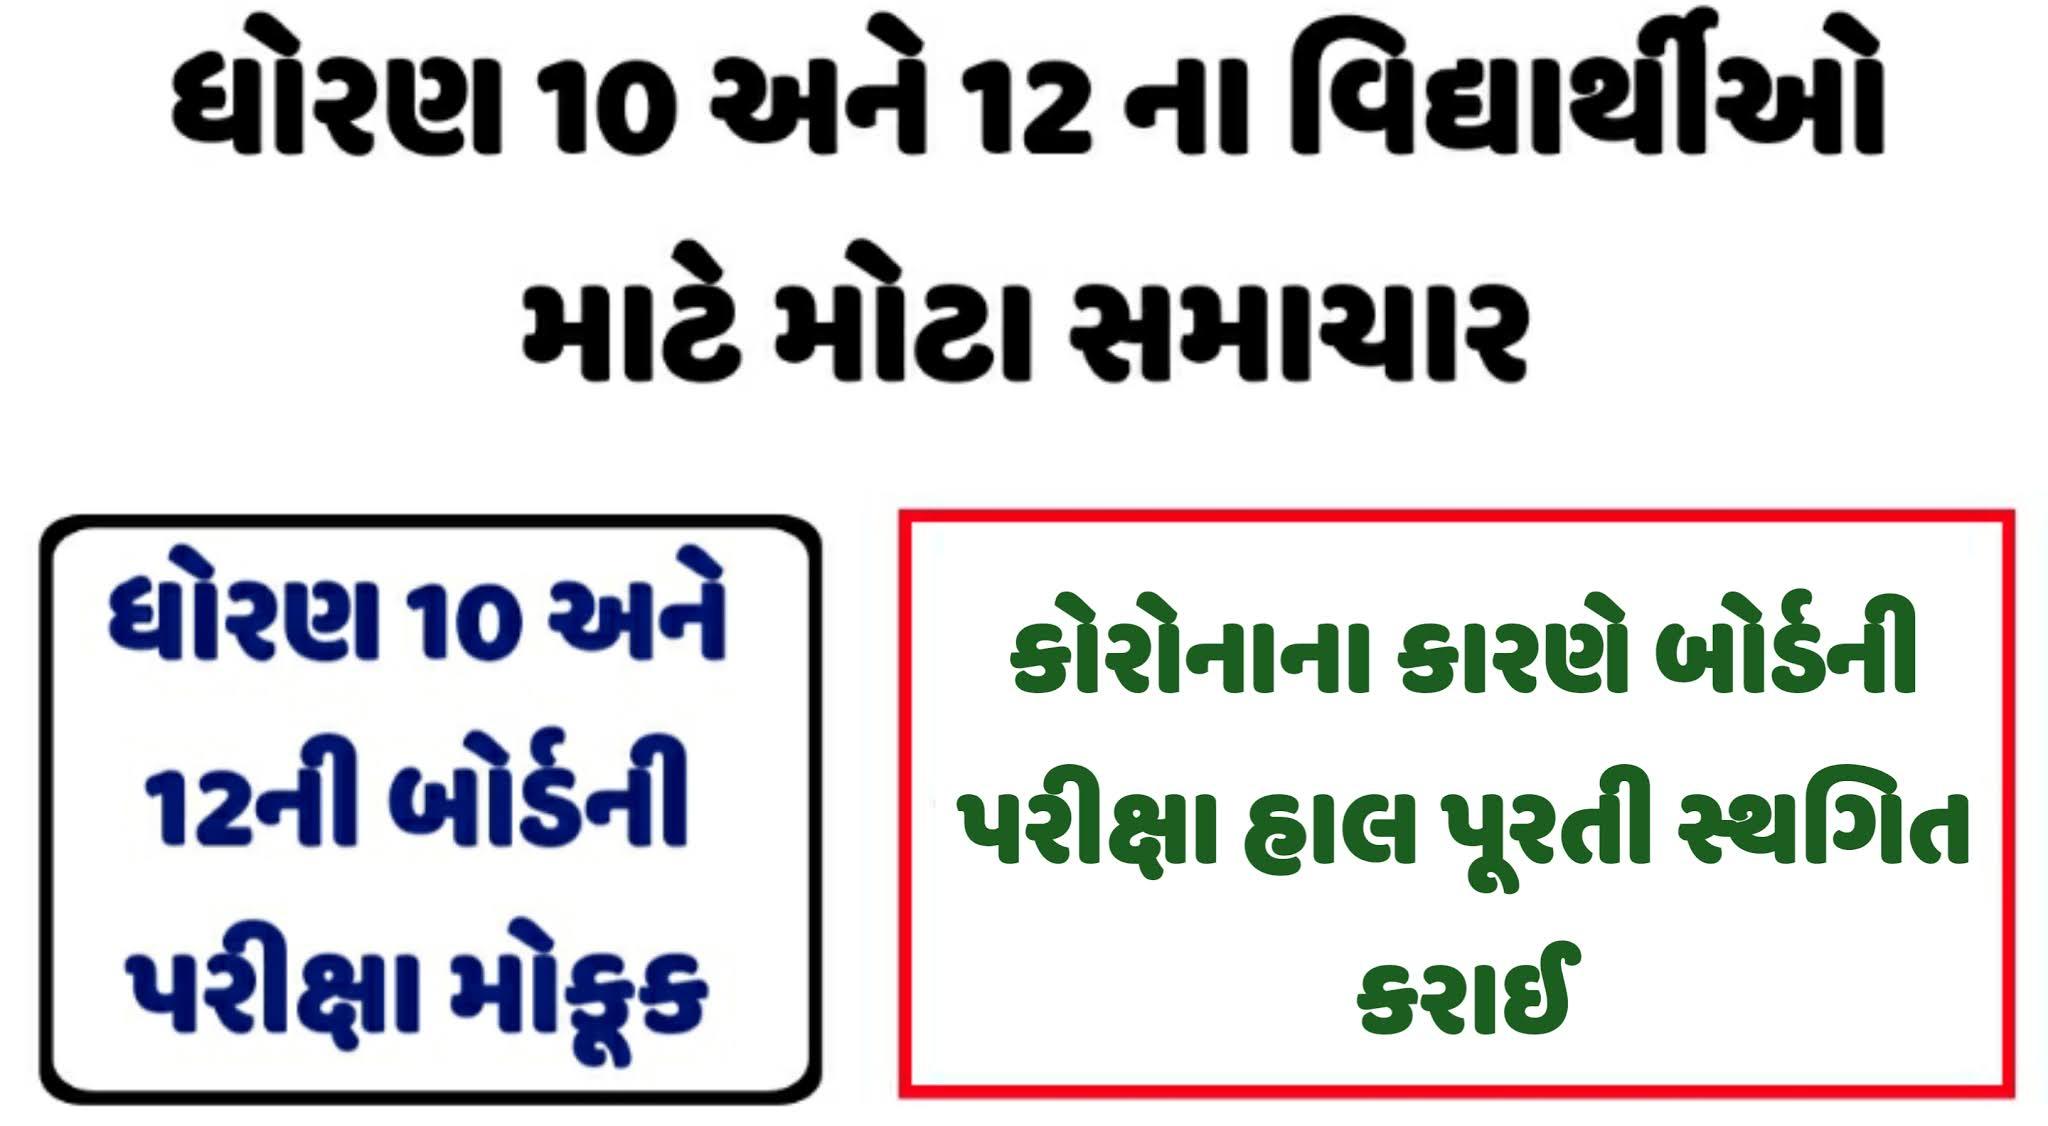 Gujarat Board Std 10 and 12 Exam Postponed